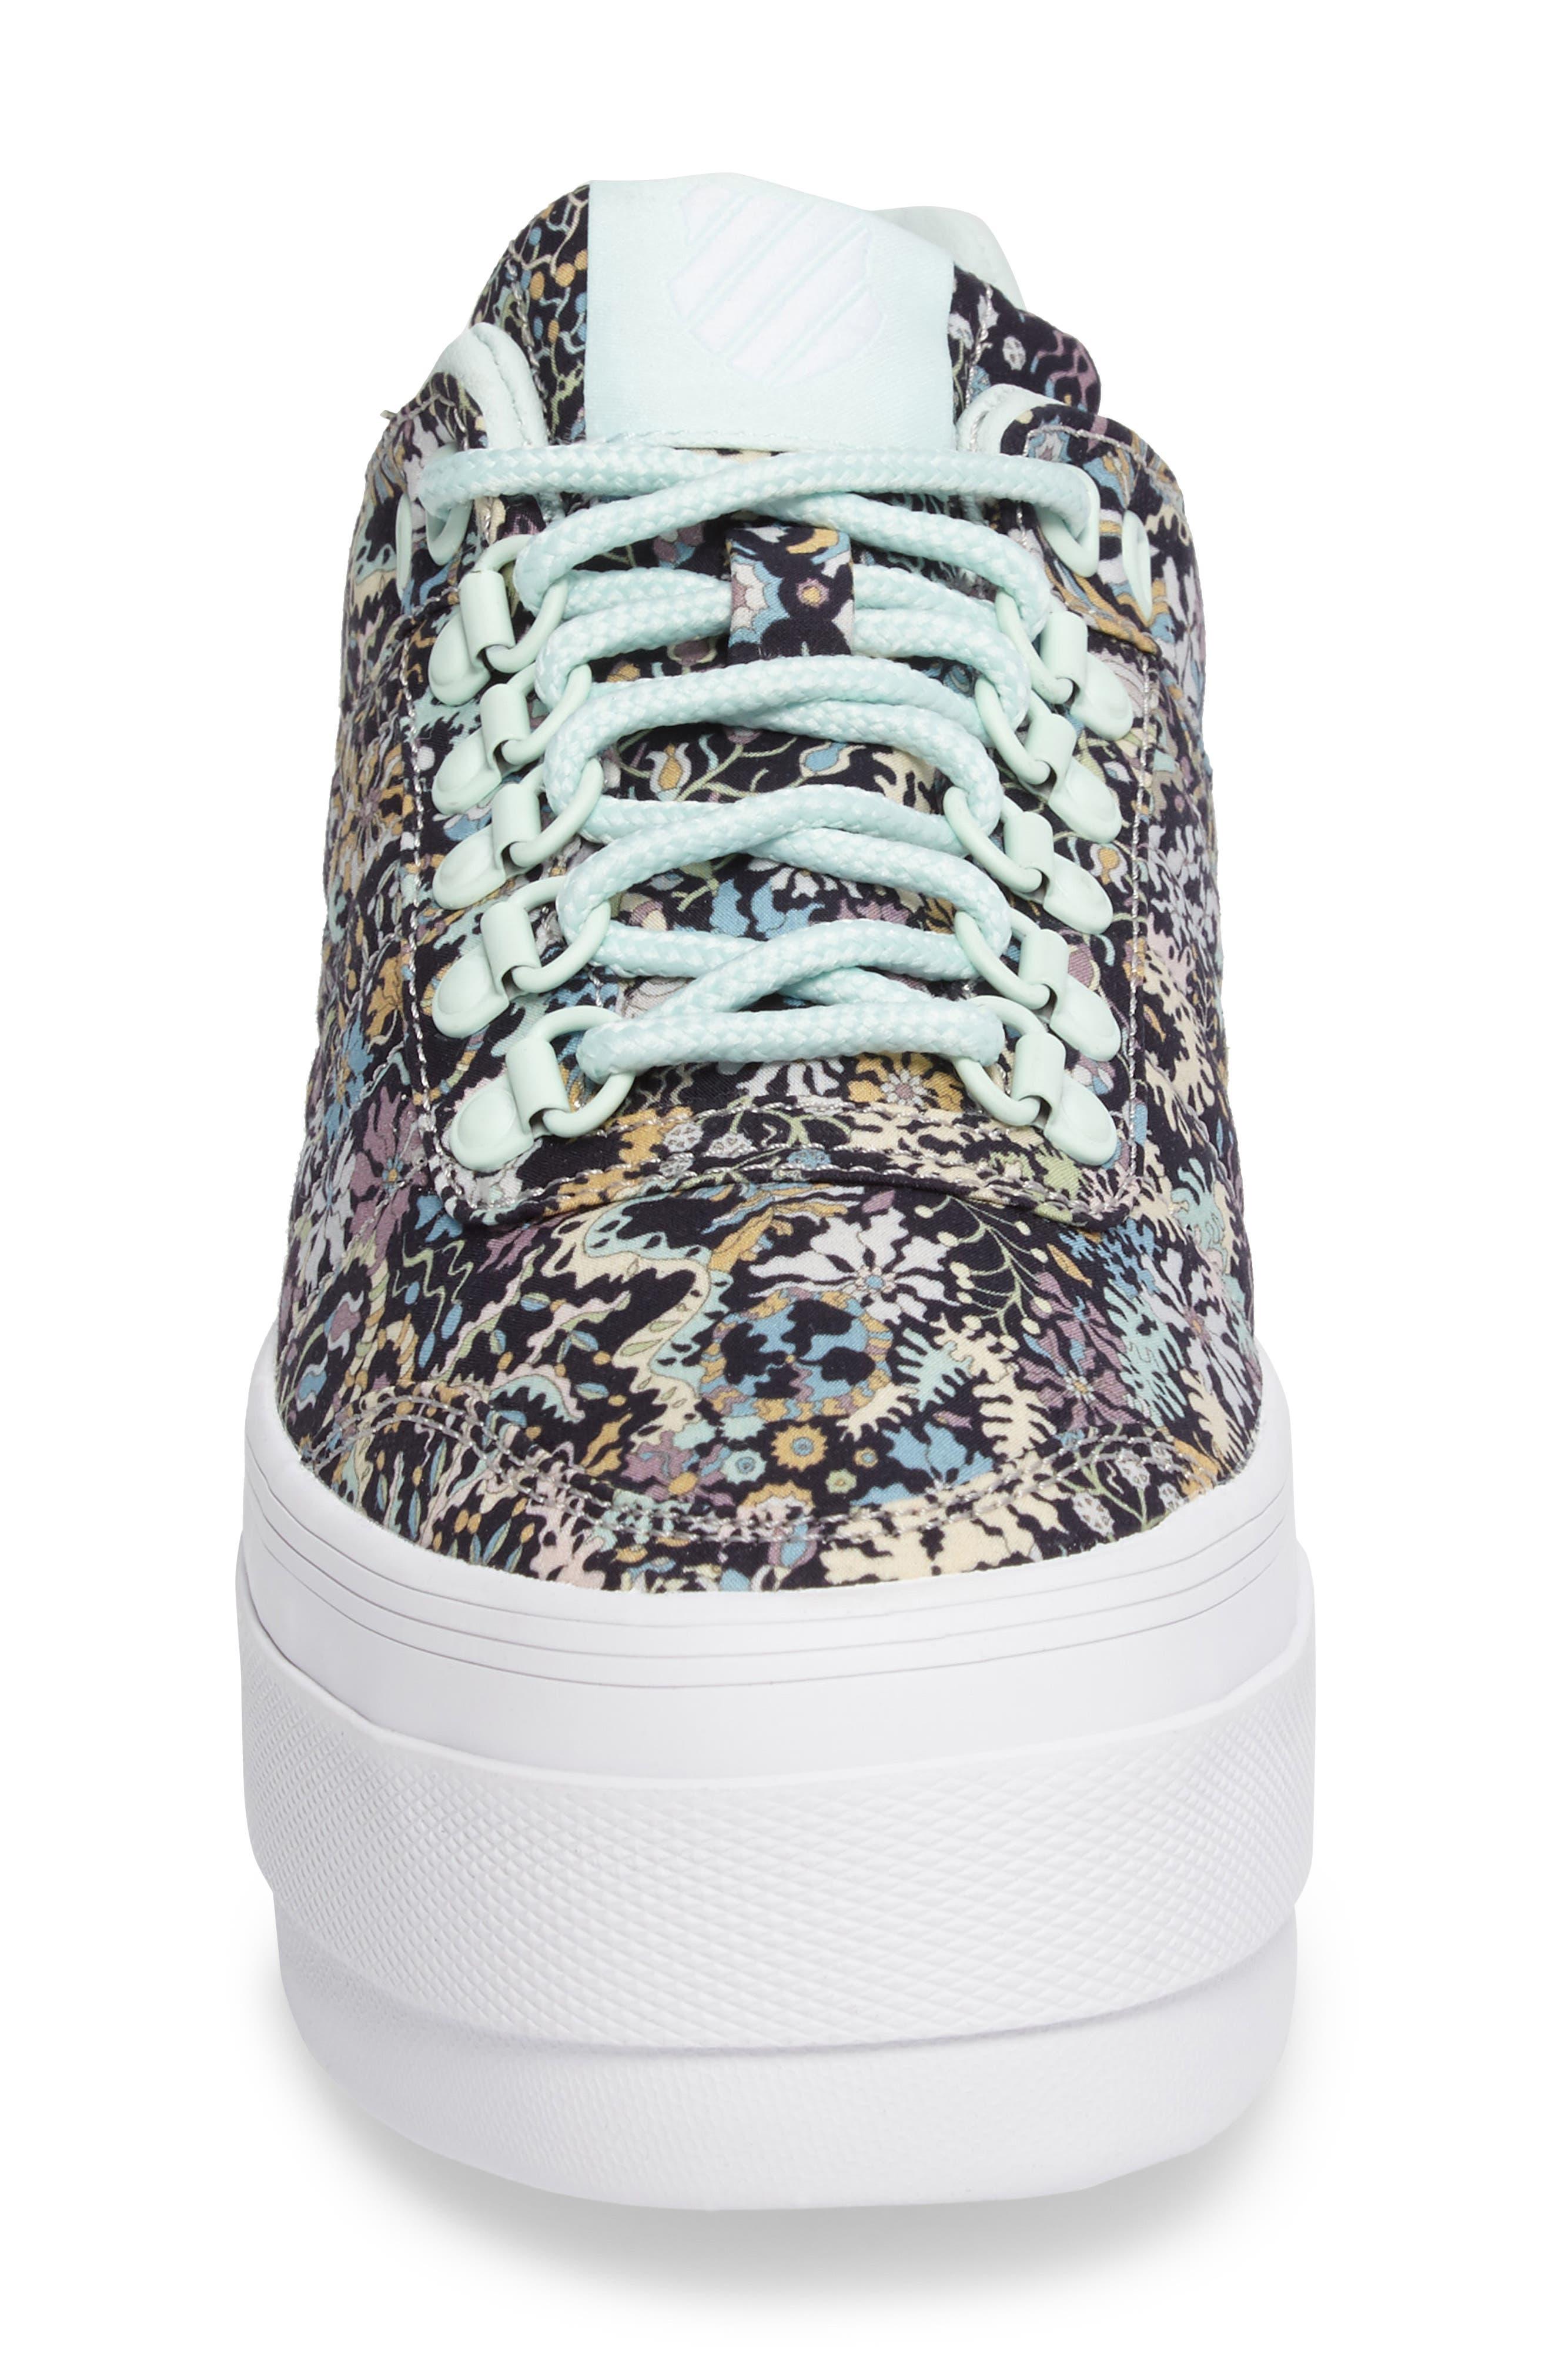 Gstaad Flatform Sneaker,                             Alternate thumbnail 4, color,                             040